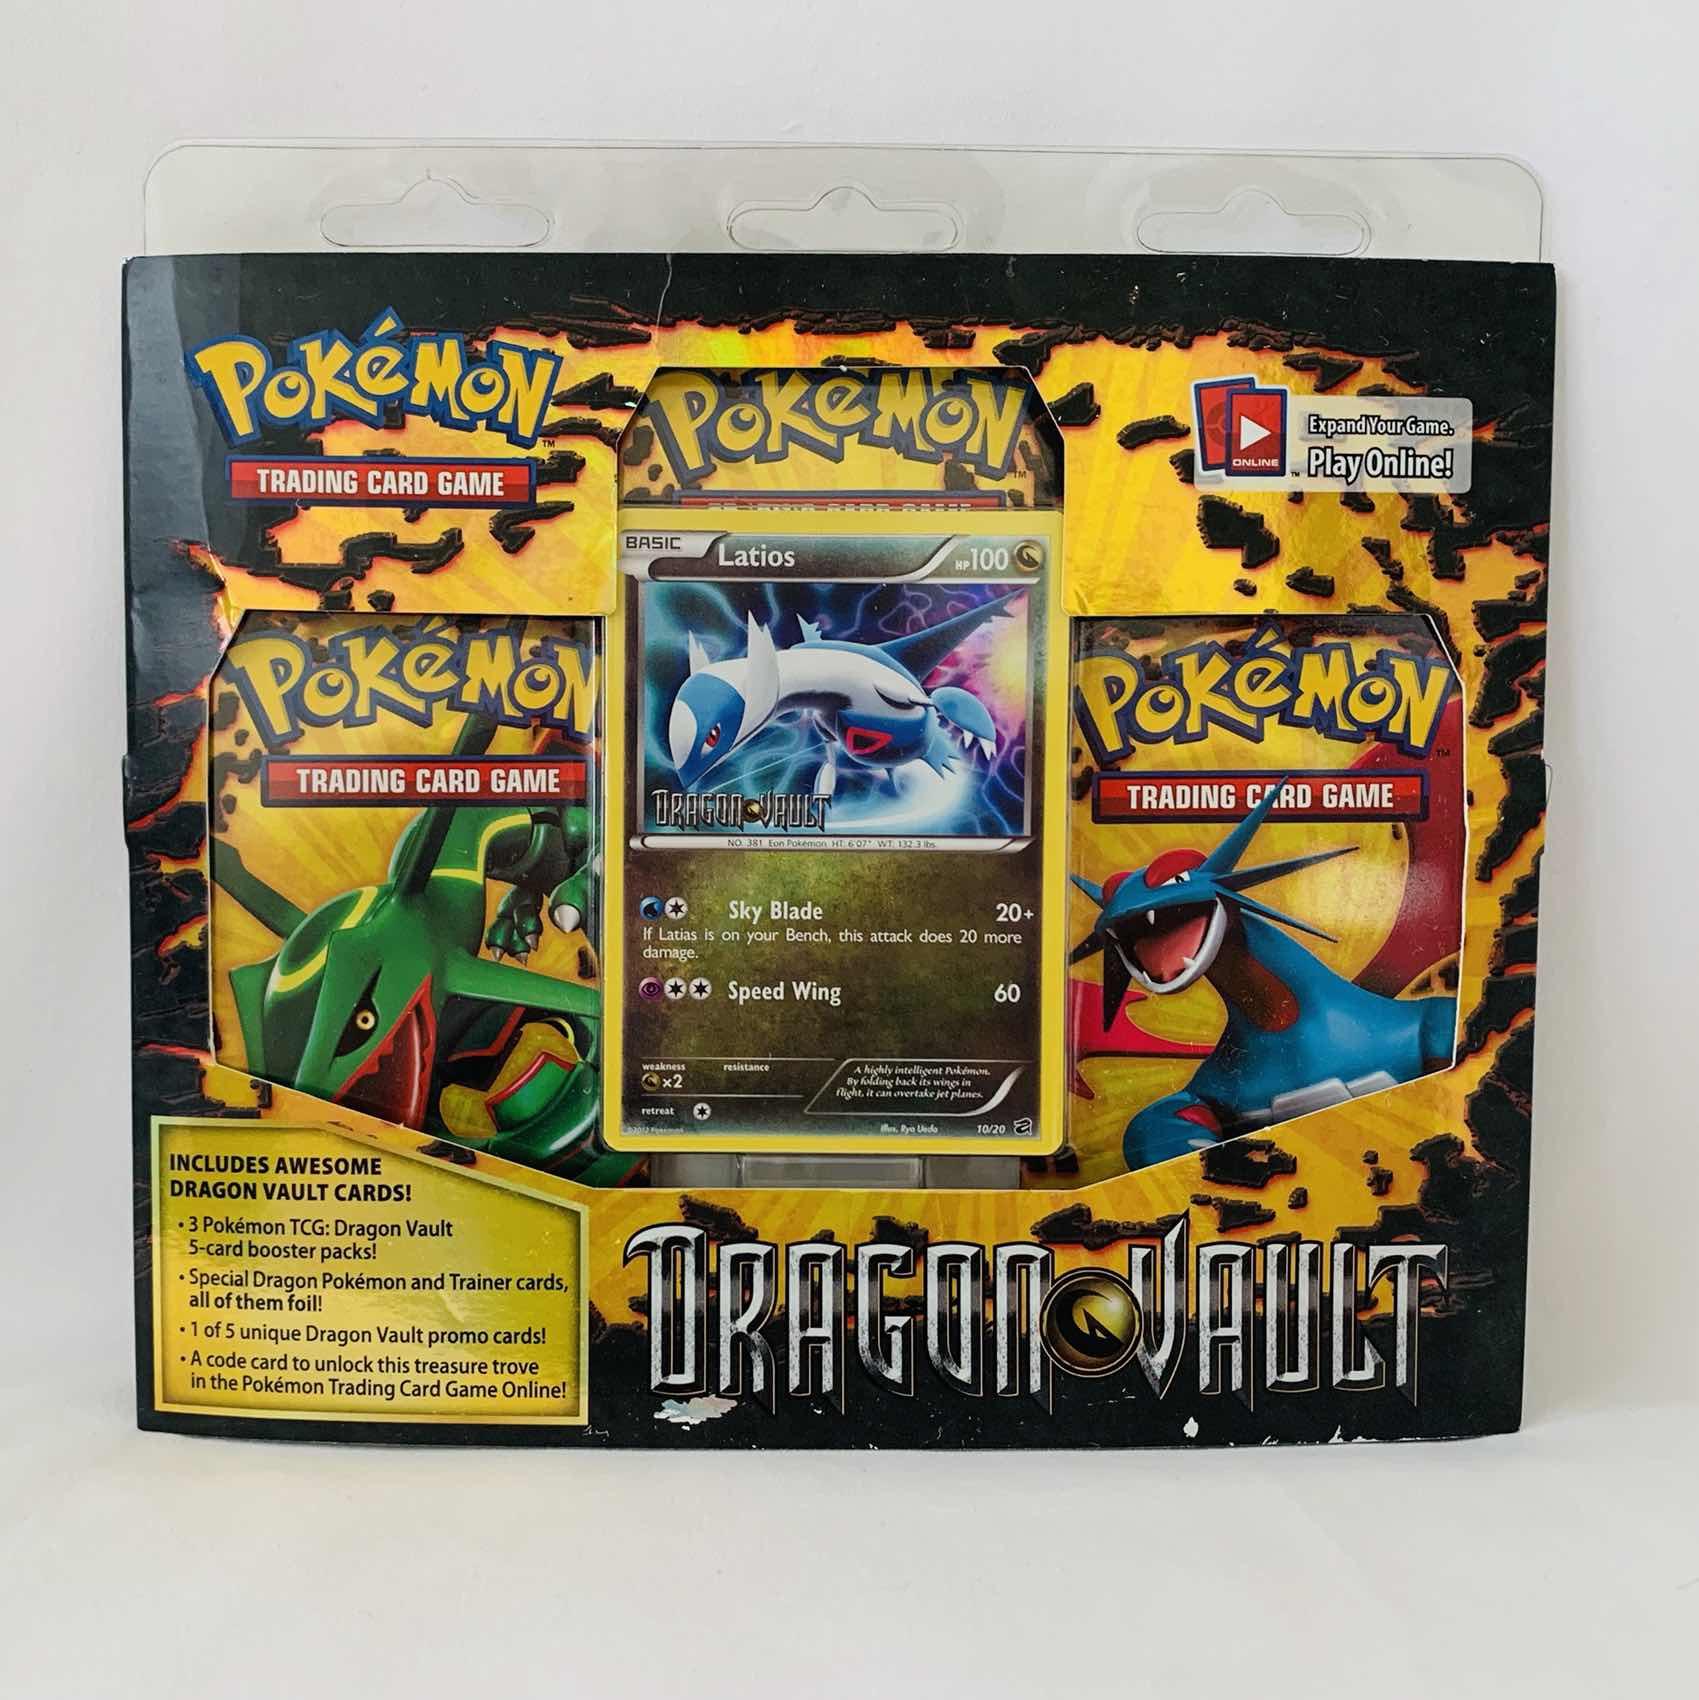 Pokémon Dragon Vault Latios Trading Card Game